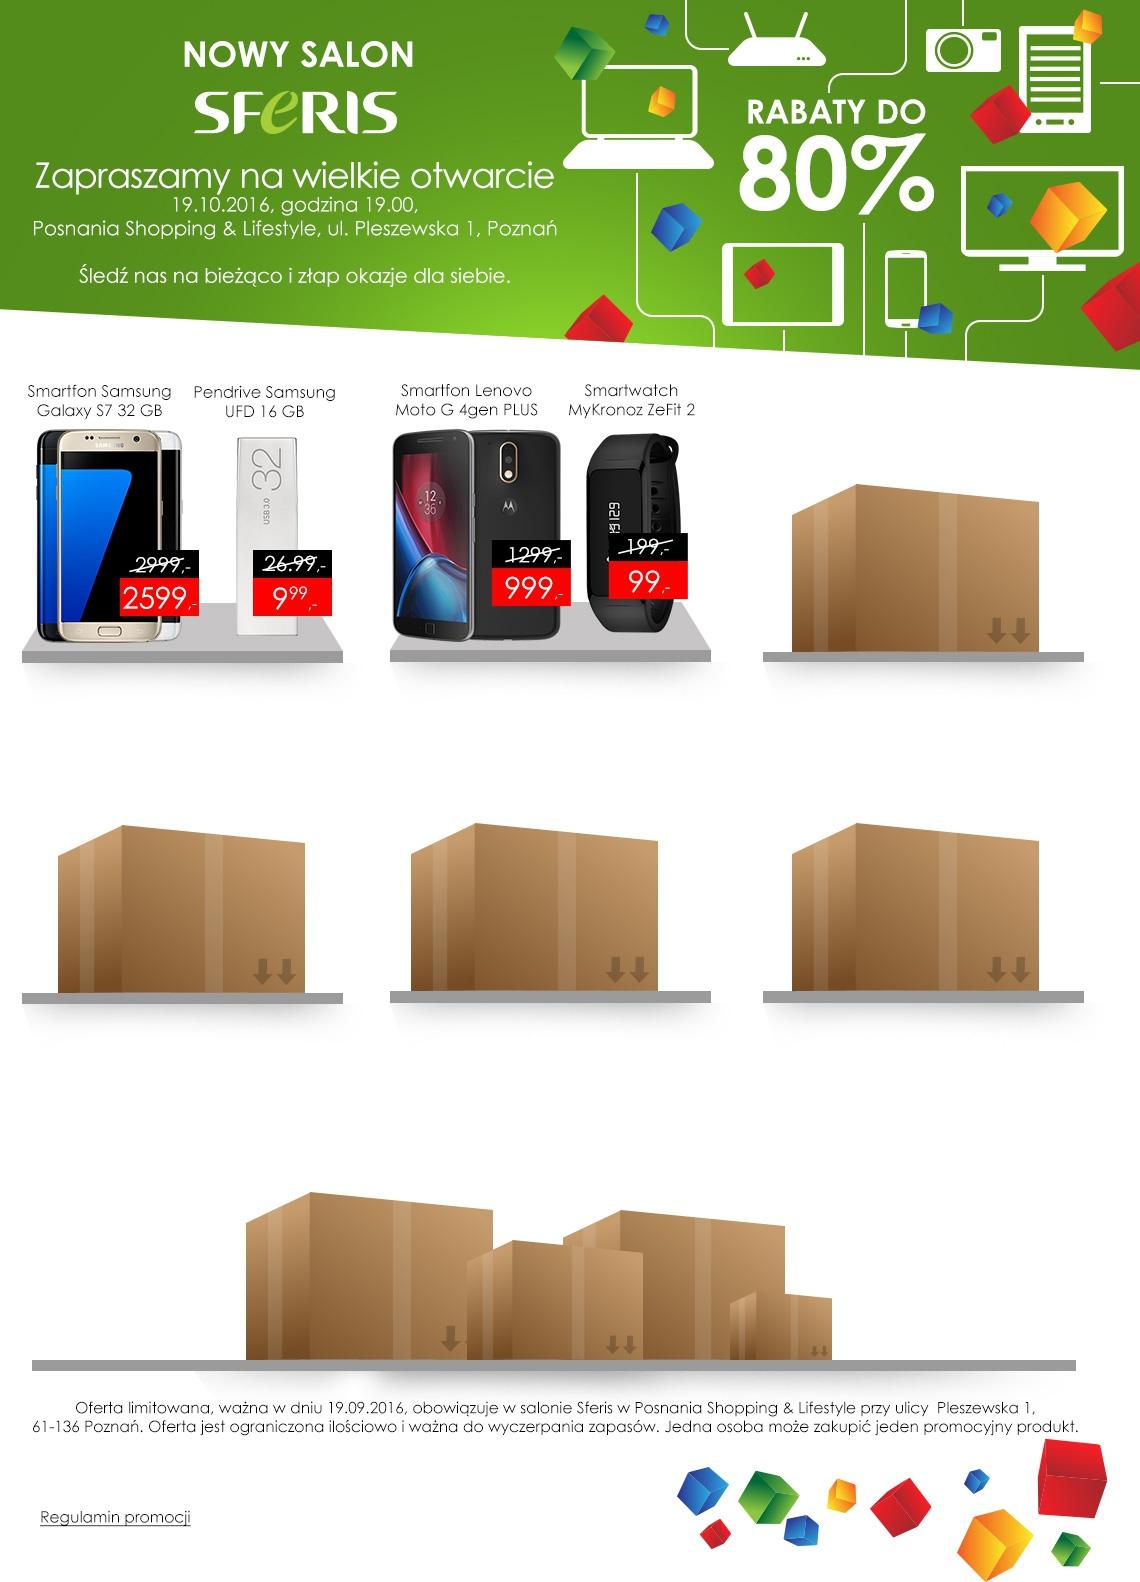 Pendrive Samsung 16GB za 9,99zł, Lenovo Moto G4 Plus za 999zł, MyKronoz ZeFit 2 za 99zł i inne @ Sferis (Poznań)